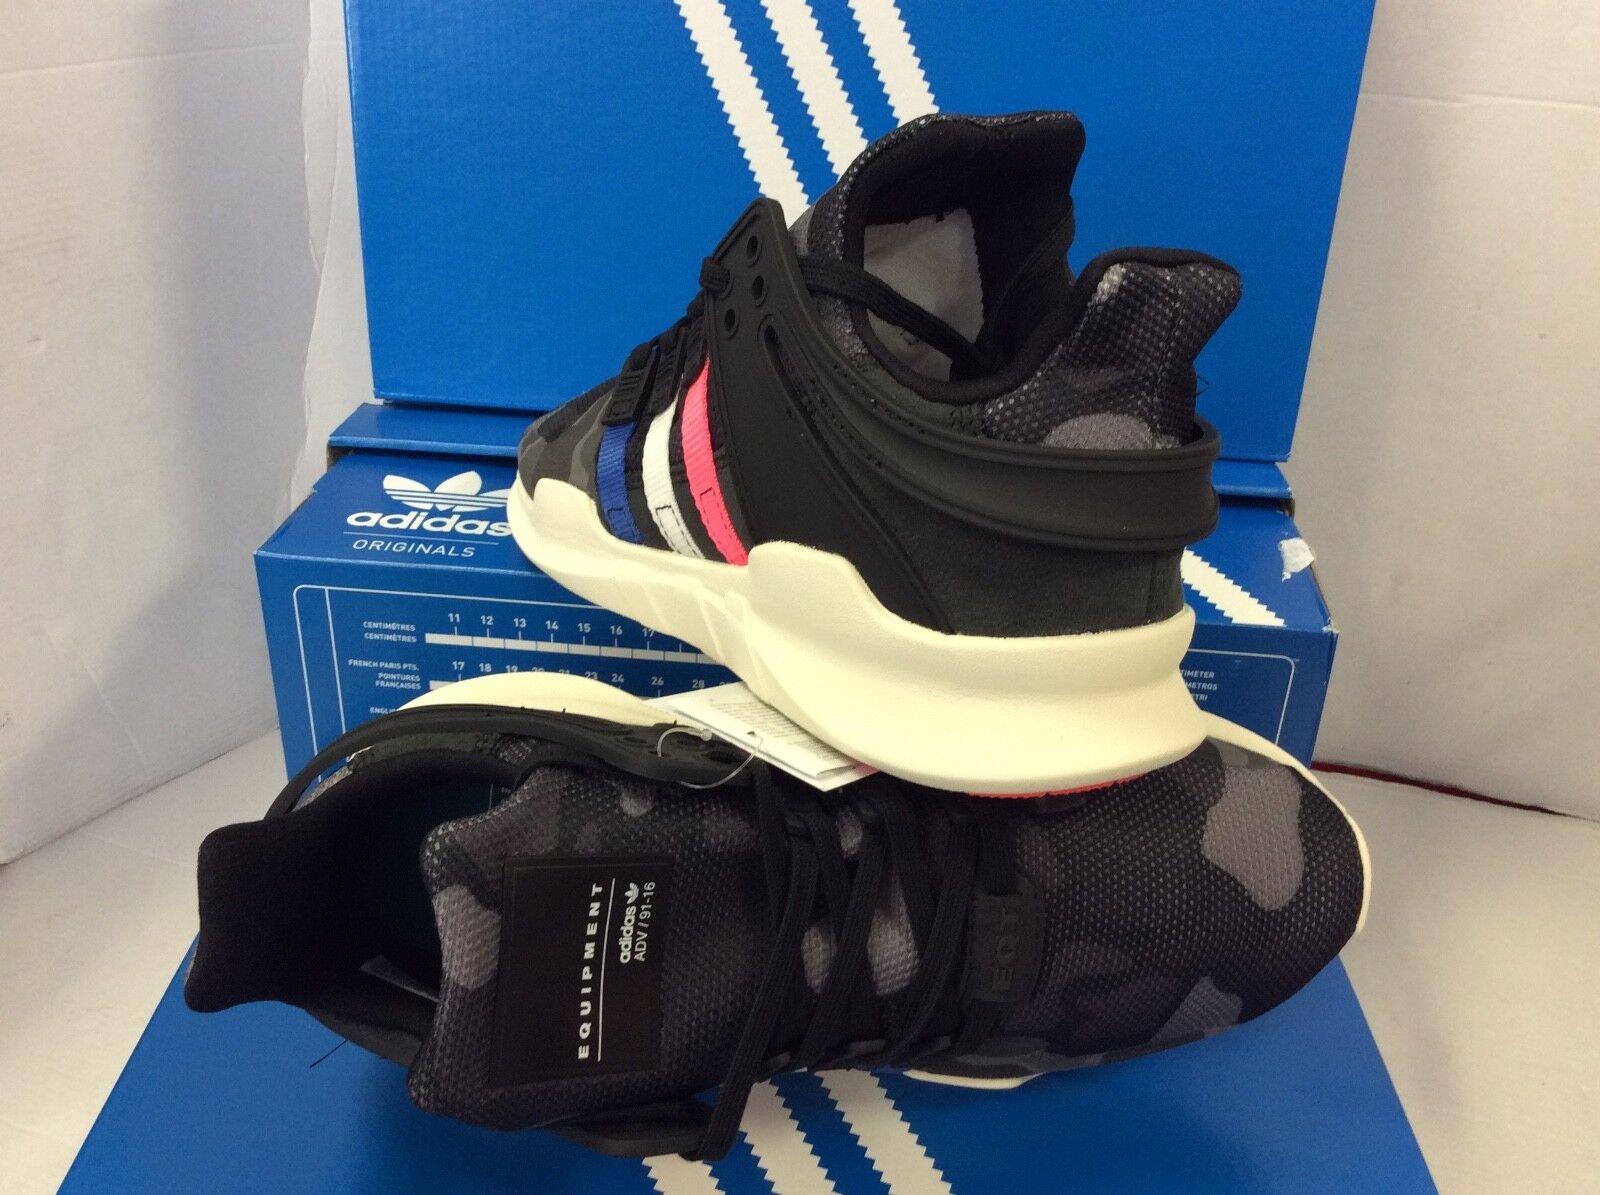 adidas Tubular Doom to homme Trainers~Bottes~Originals~Primeknit~UK 3.5 to Doom 12 Only ad5659